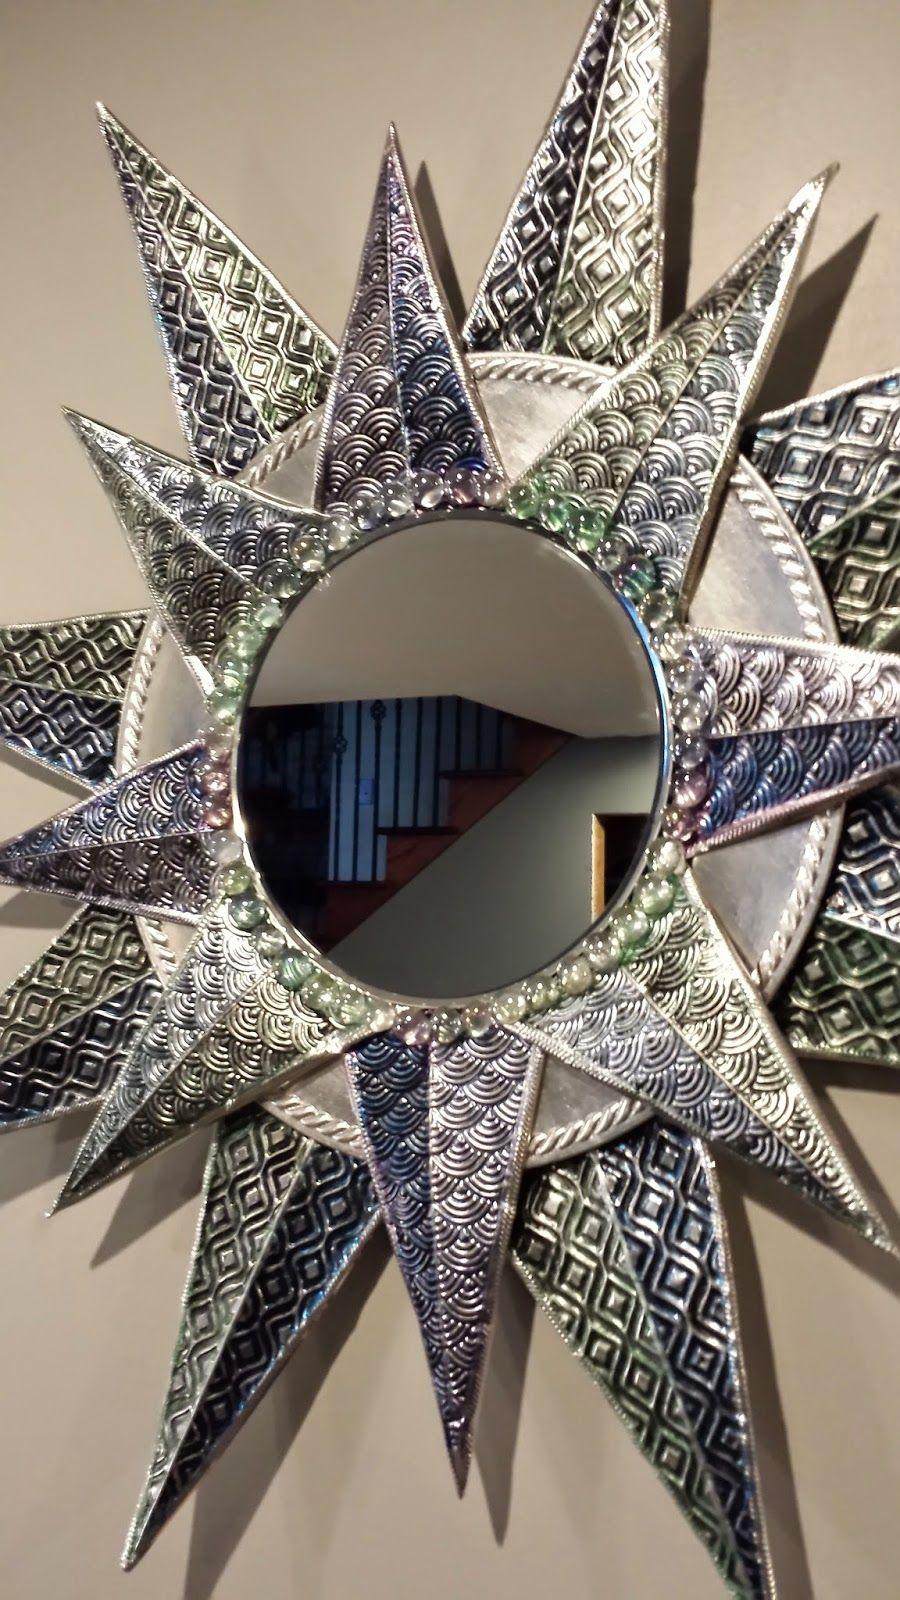 DIY - Charger Plate Metal Embossed Sunburst Mirror